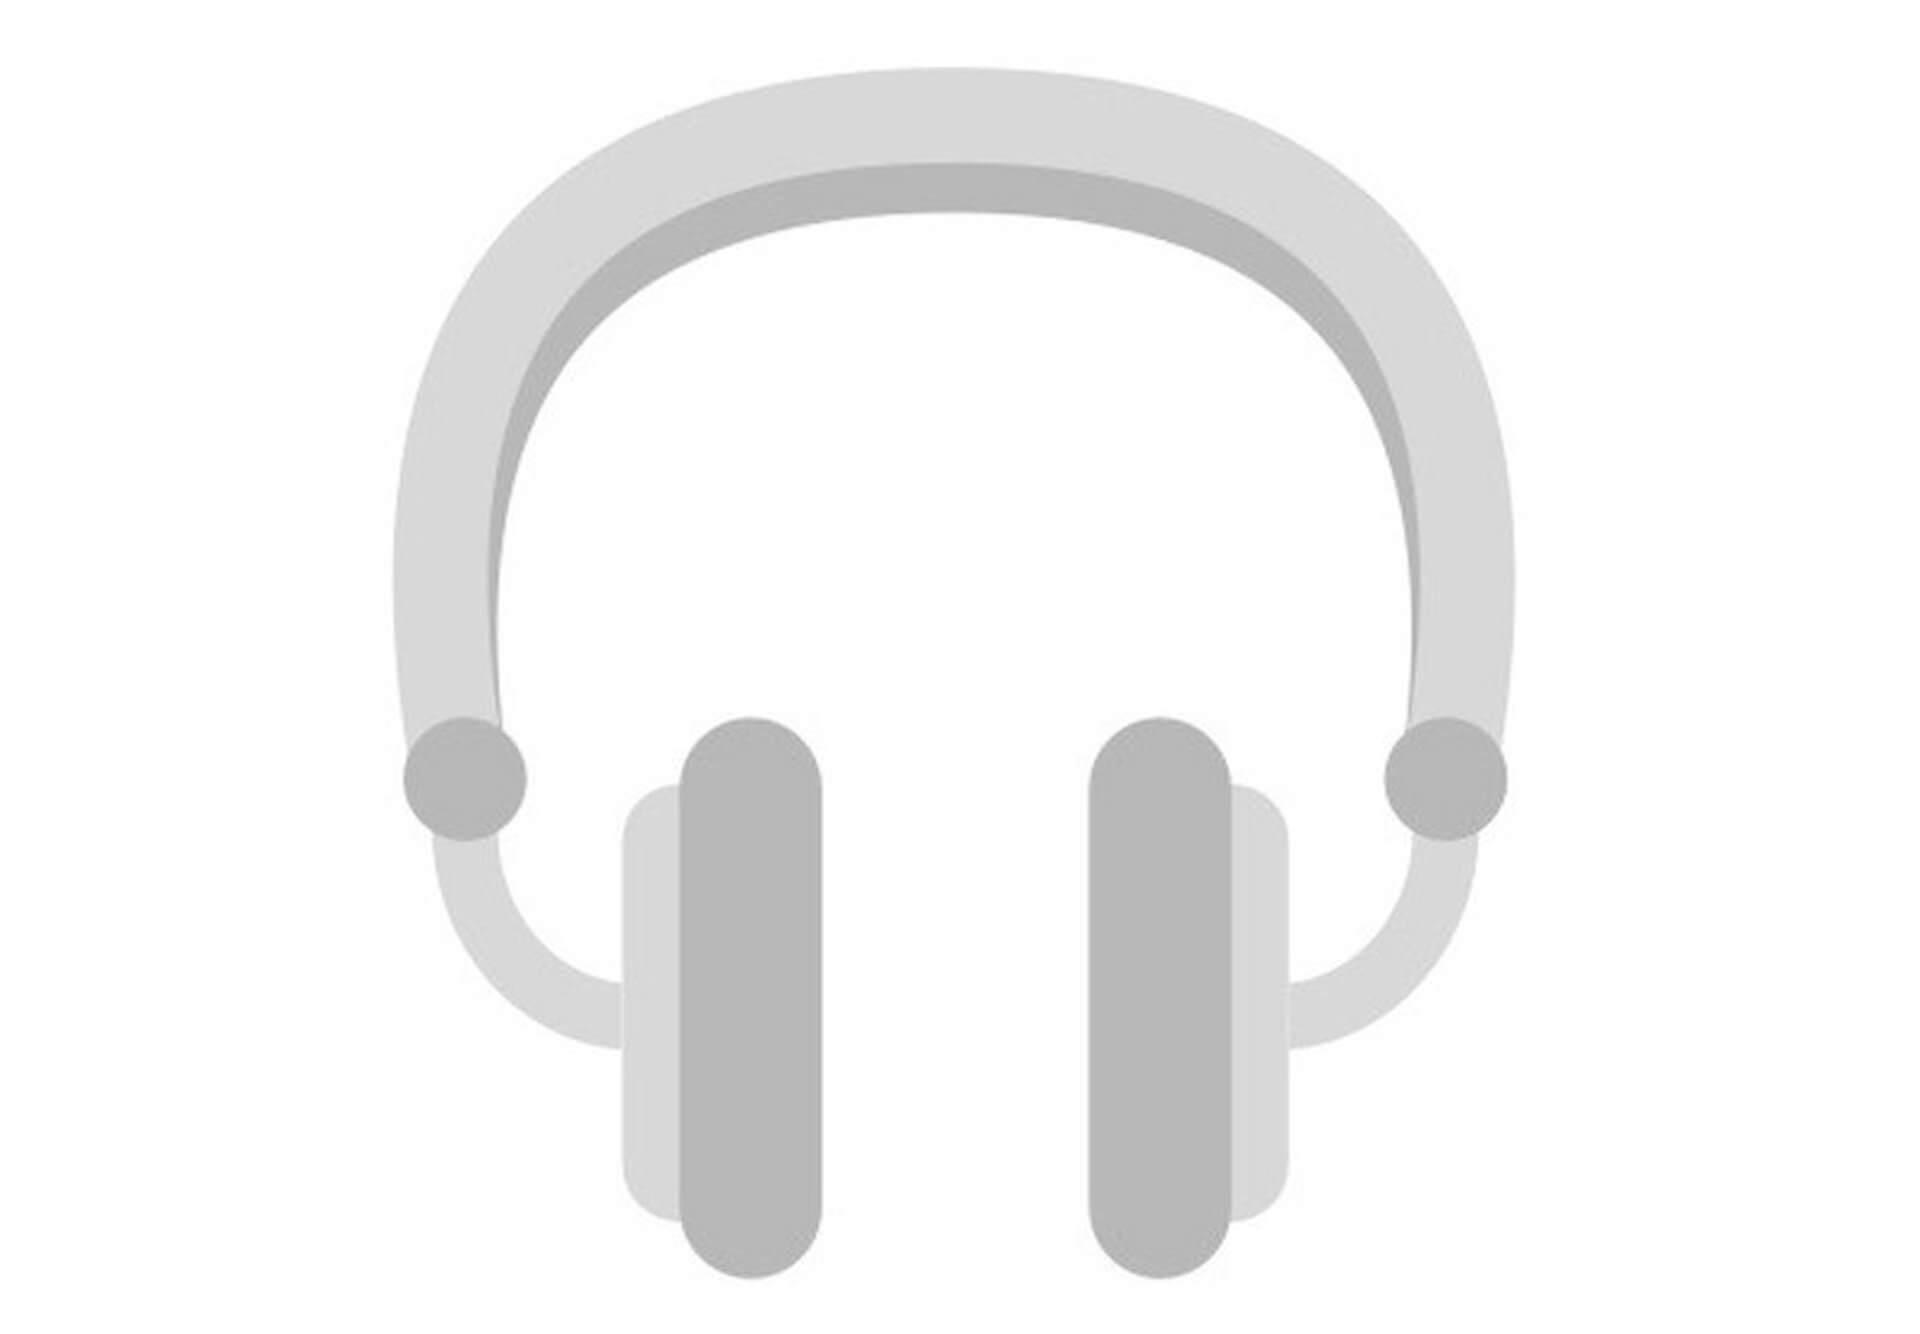 iOS 14.3でAirPods Studioのアイコンが発見される 来年3月発表の布石か? tech201113_airpodsstudio_1